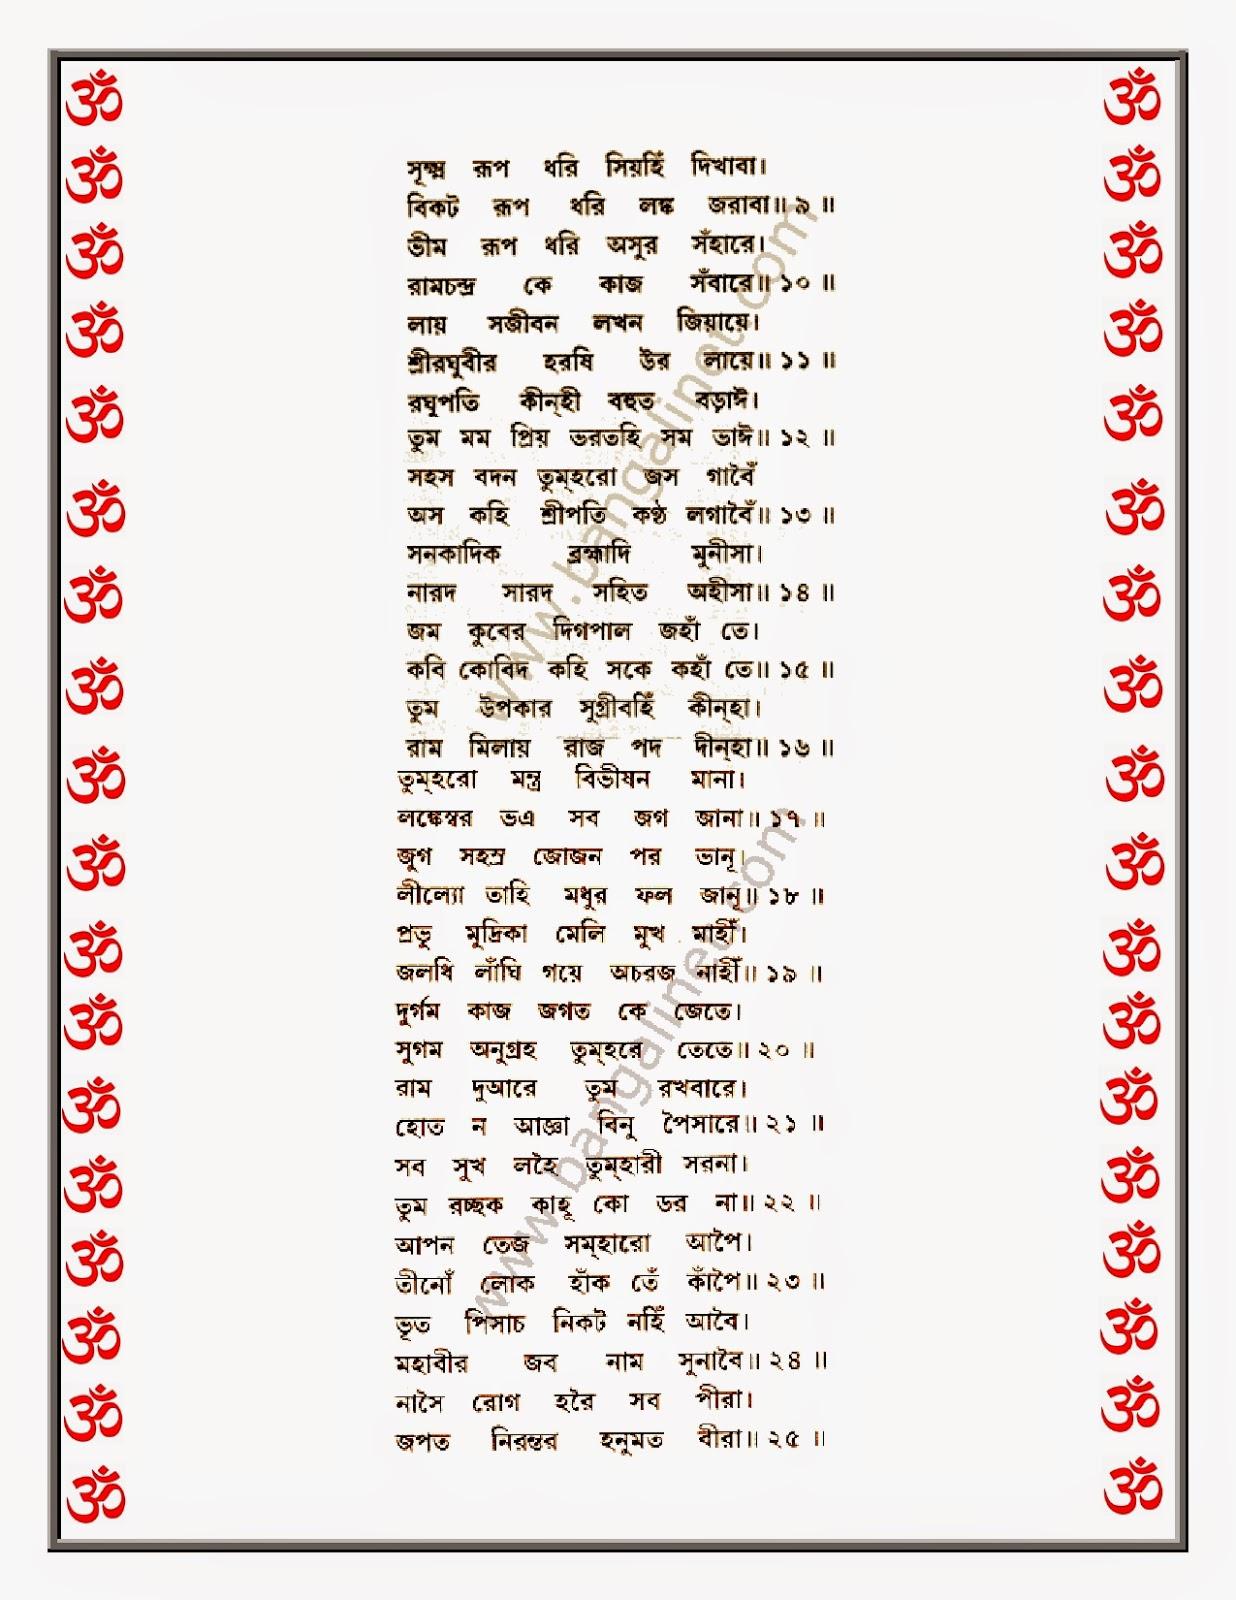 2019 Printable calendar posters images wallpapers freeOnline Hanuman chalisa in bengali language